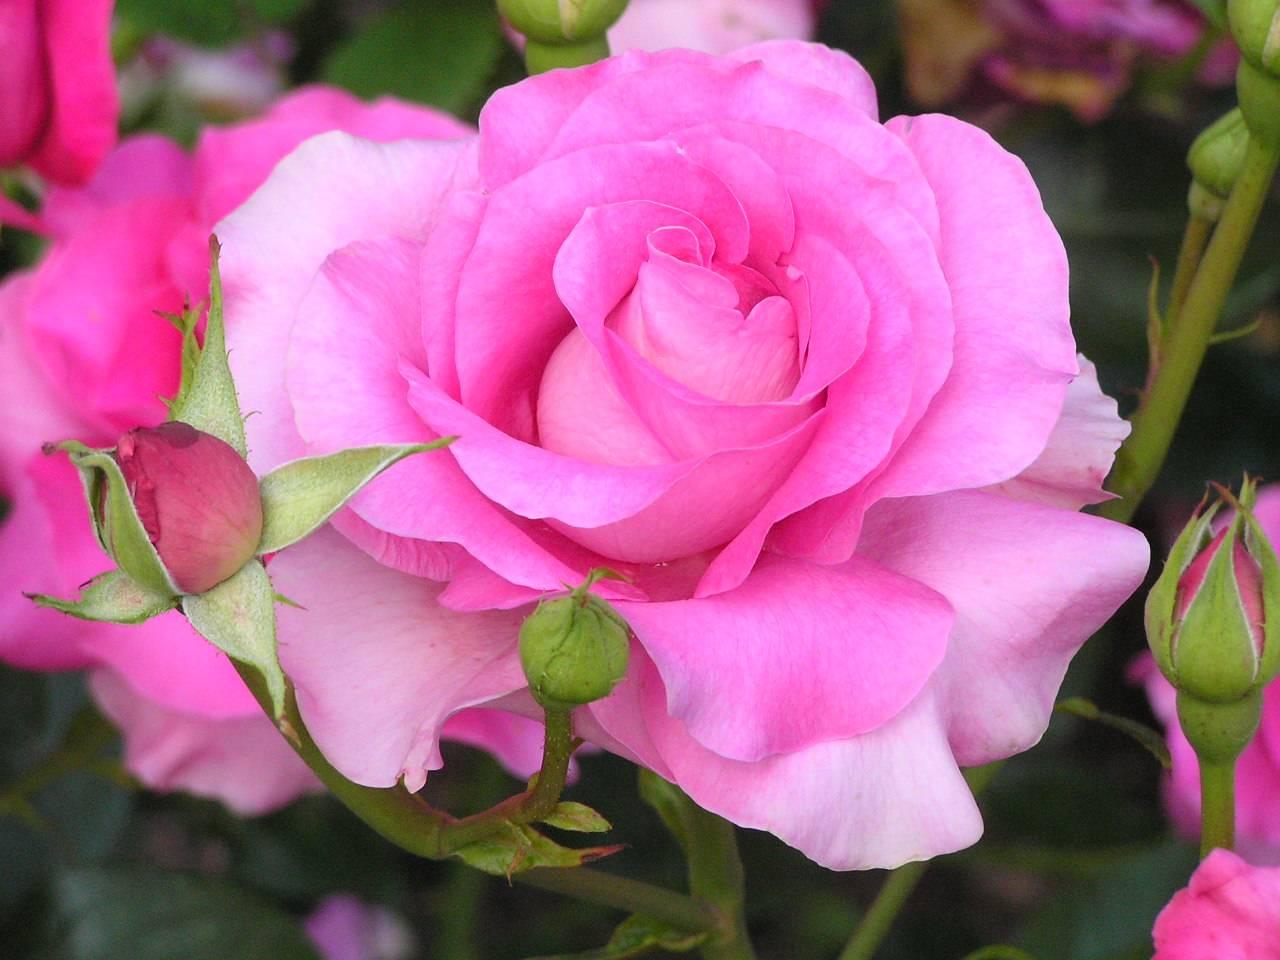 Pink Flowers Rose 1 Cool Wallpaper Hdflowerwallpaper